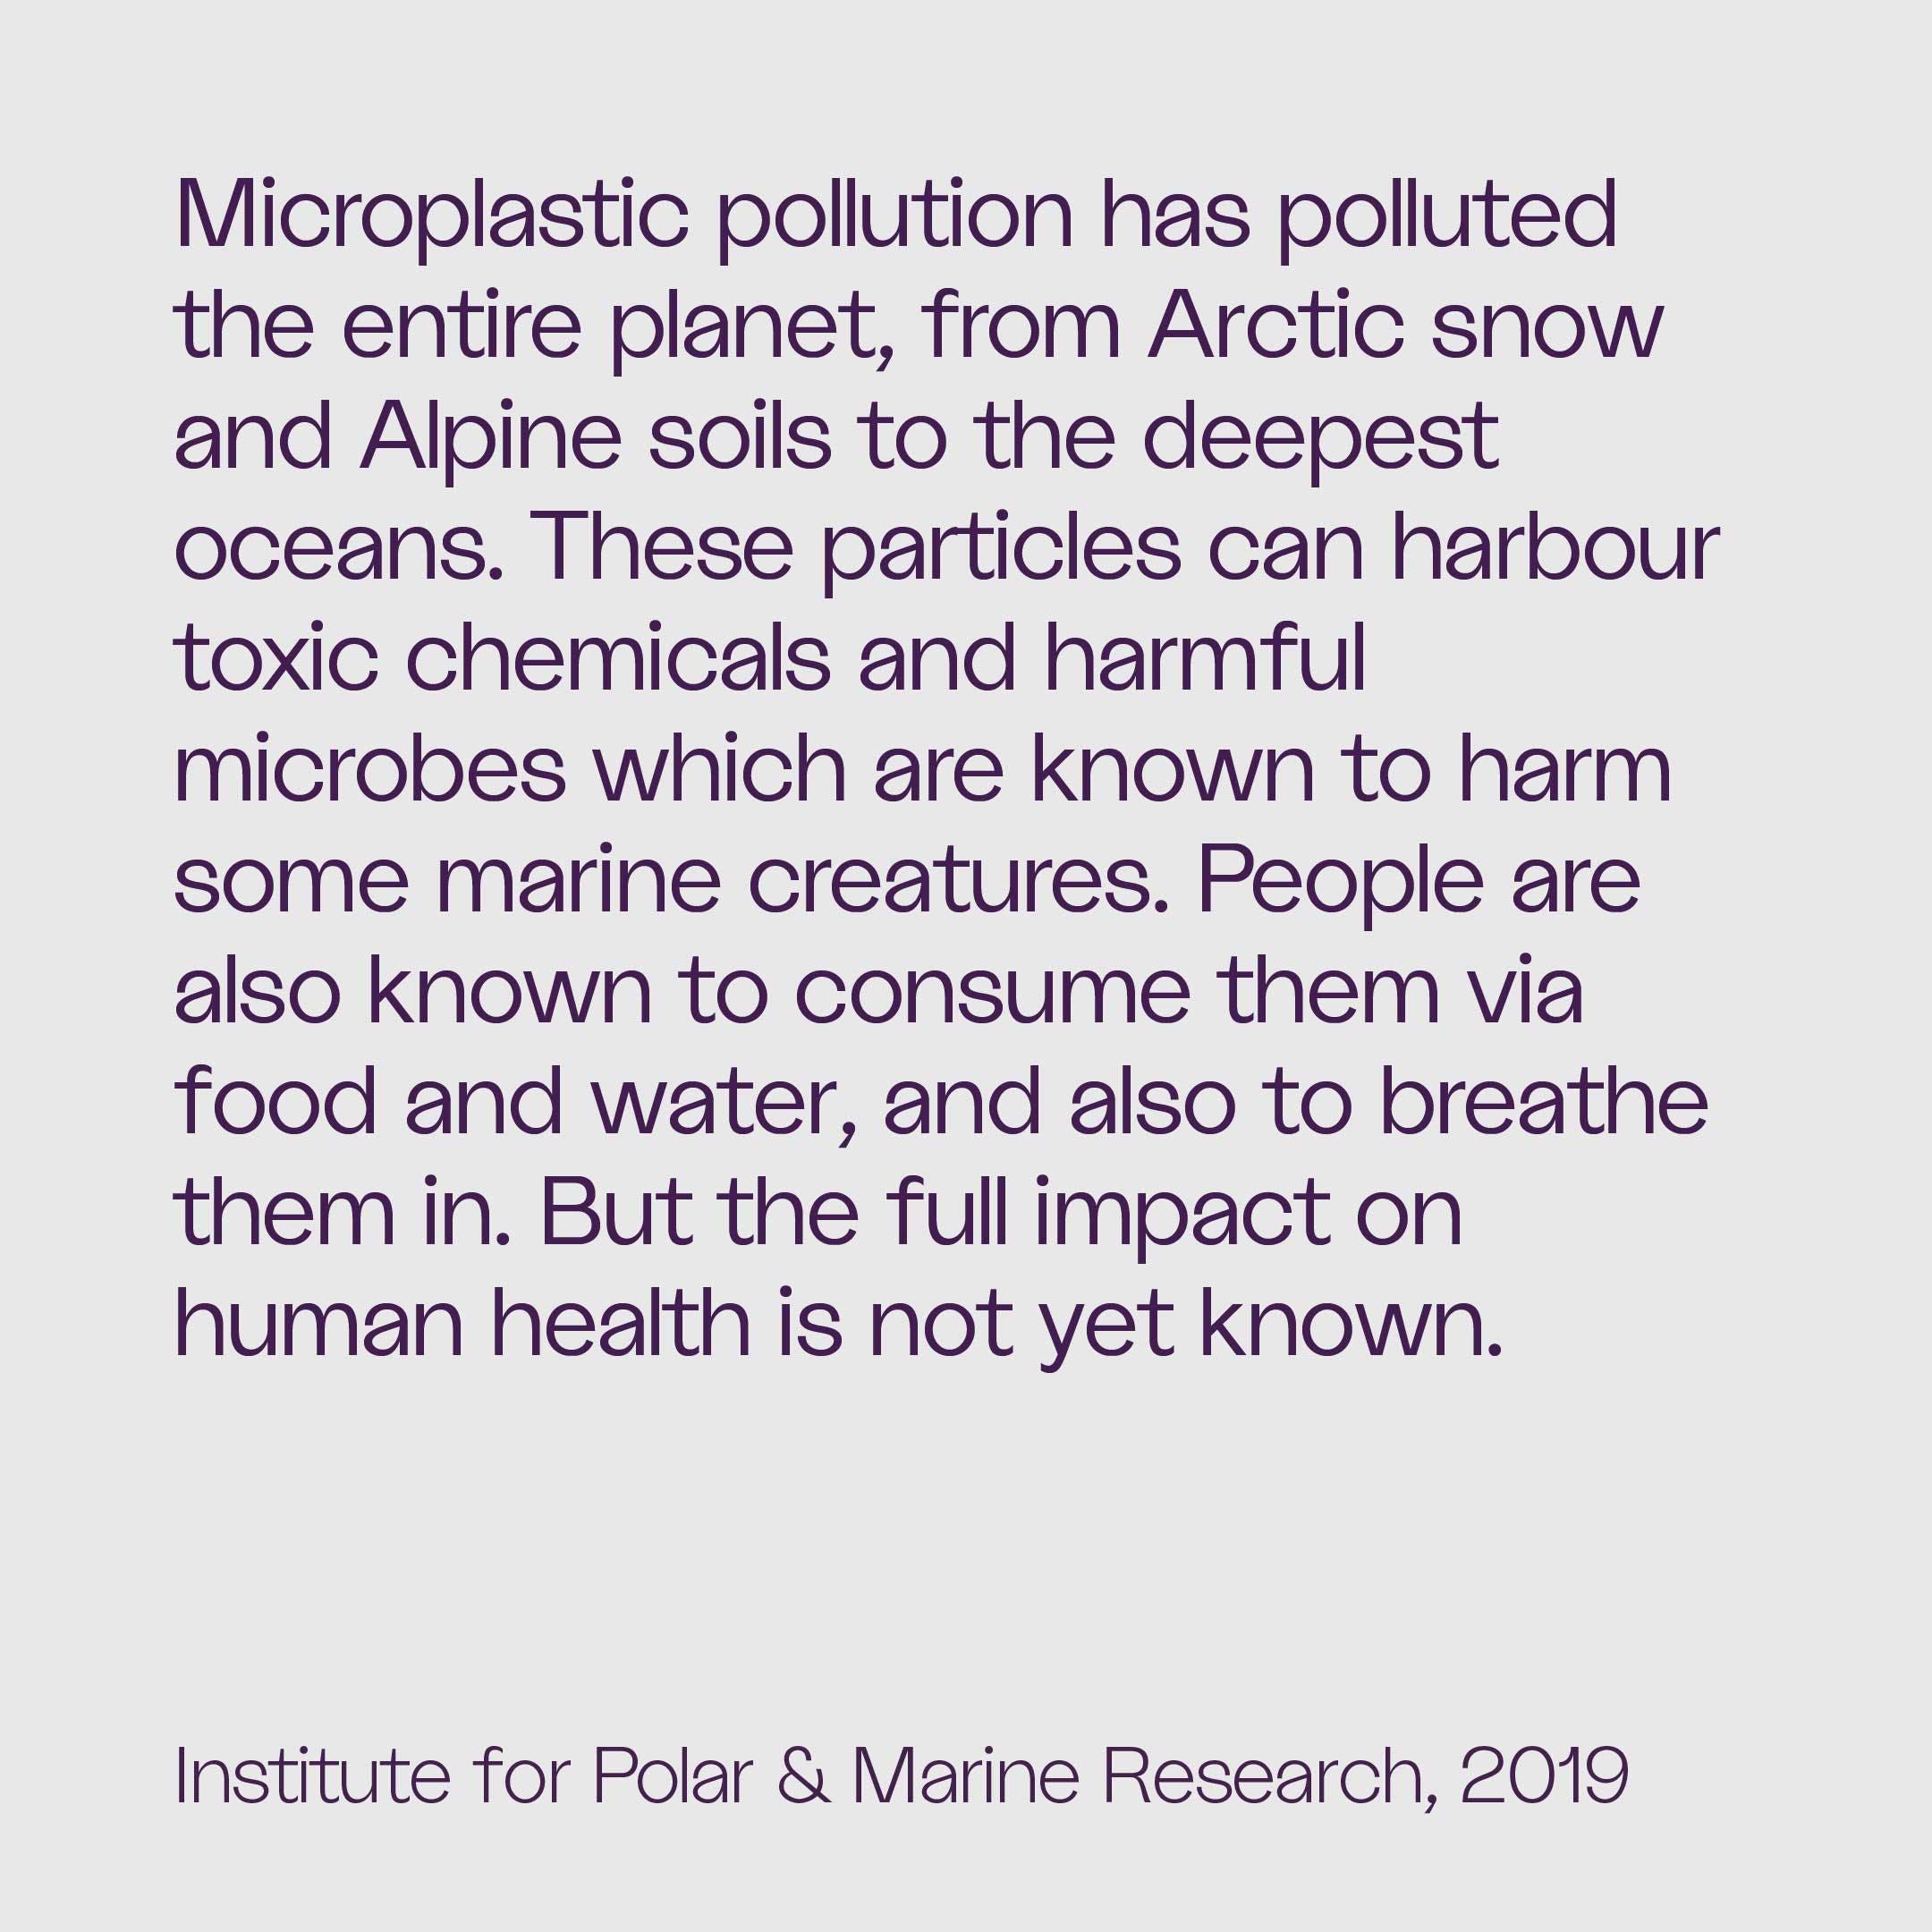 Institute for Polar & Marine Research